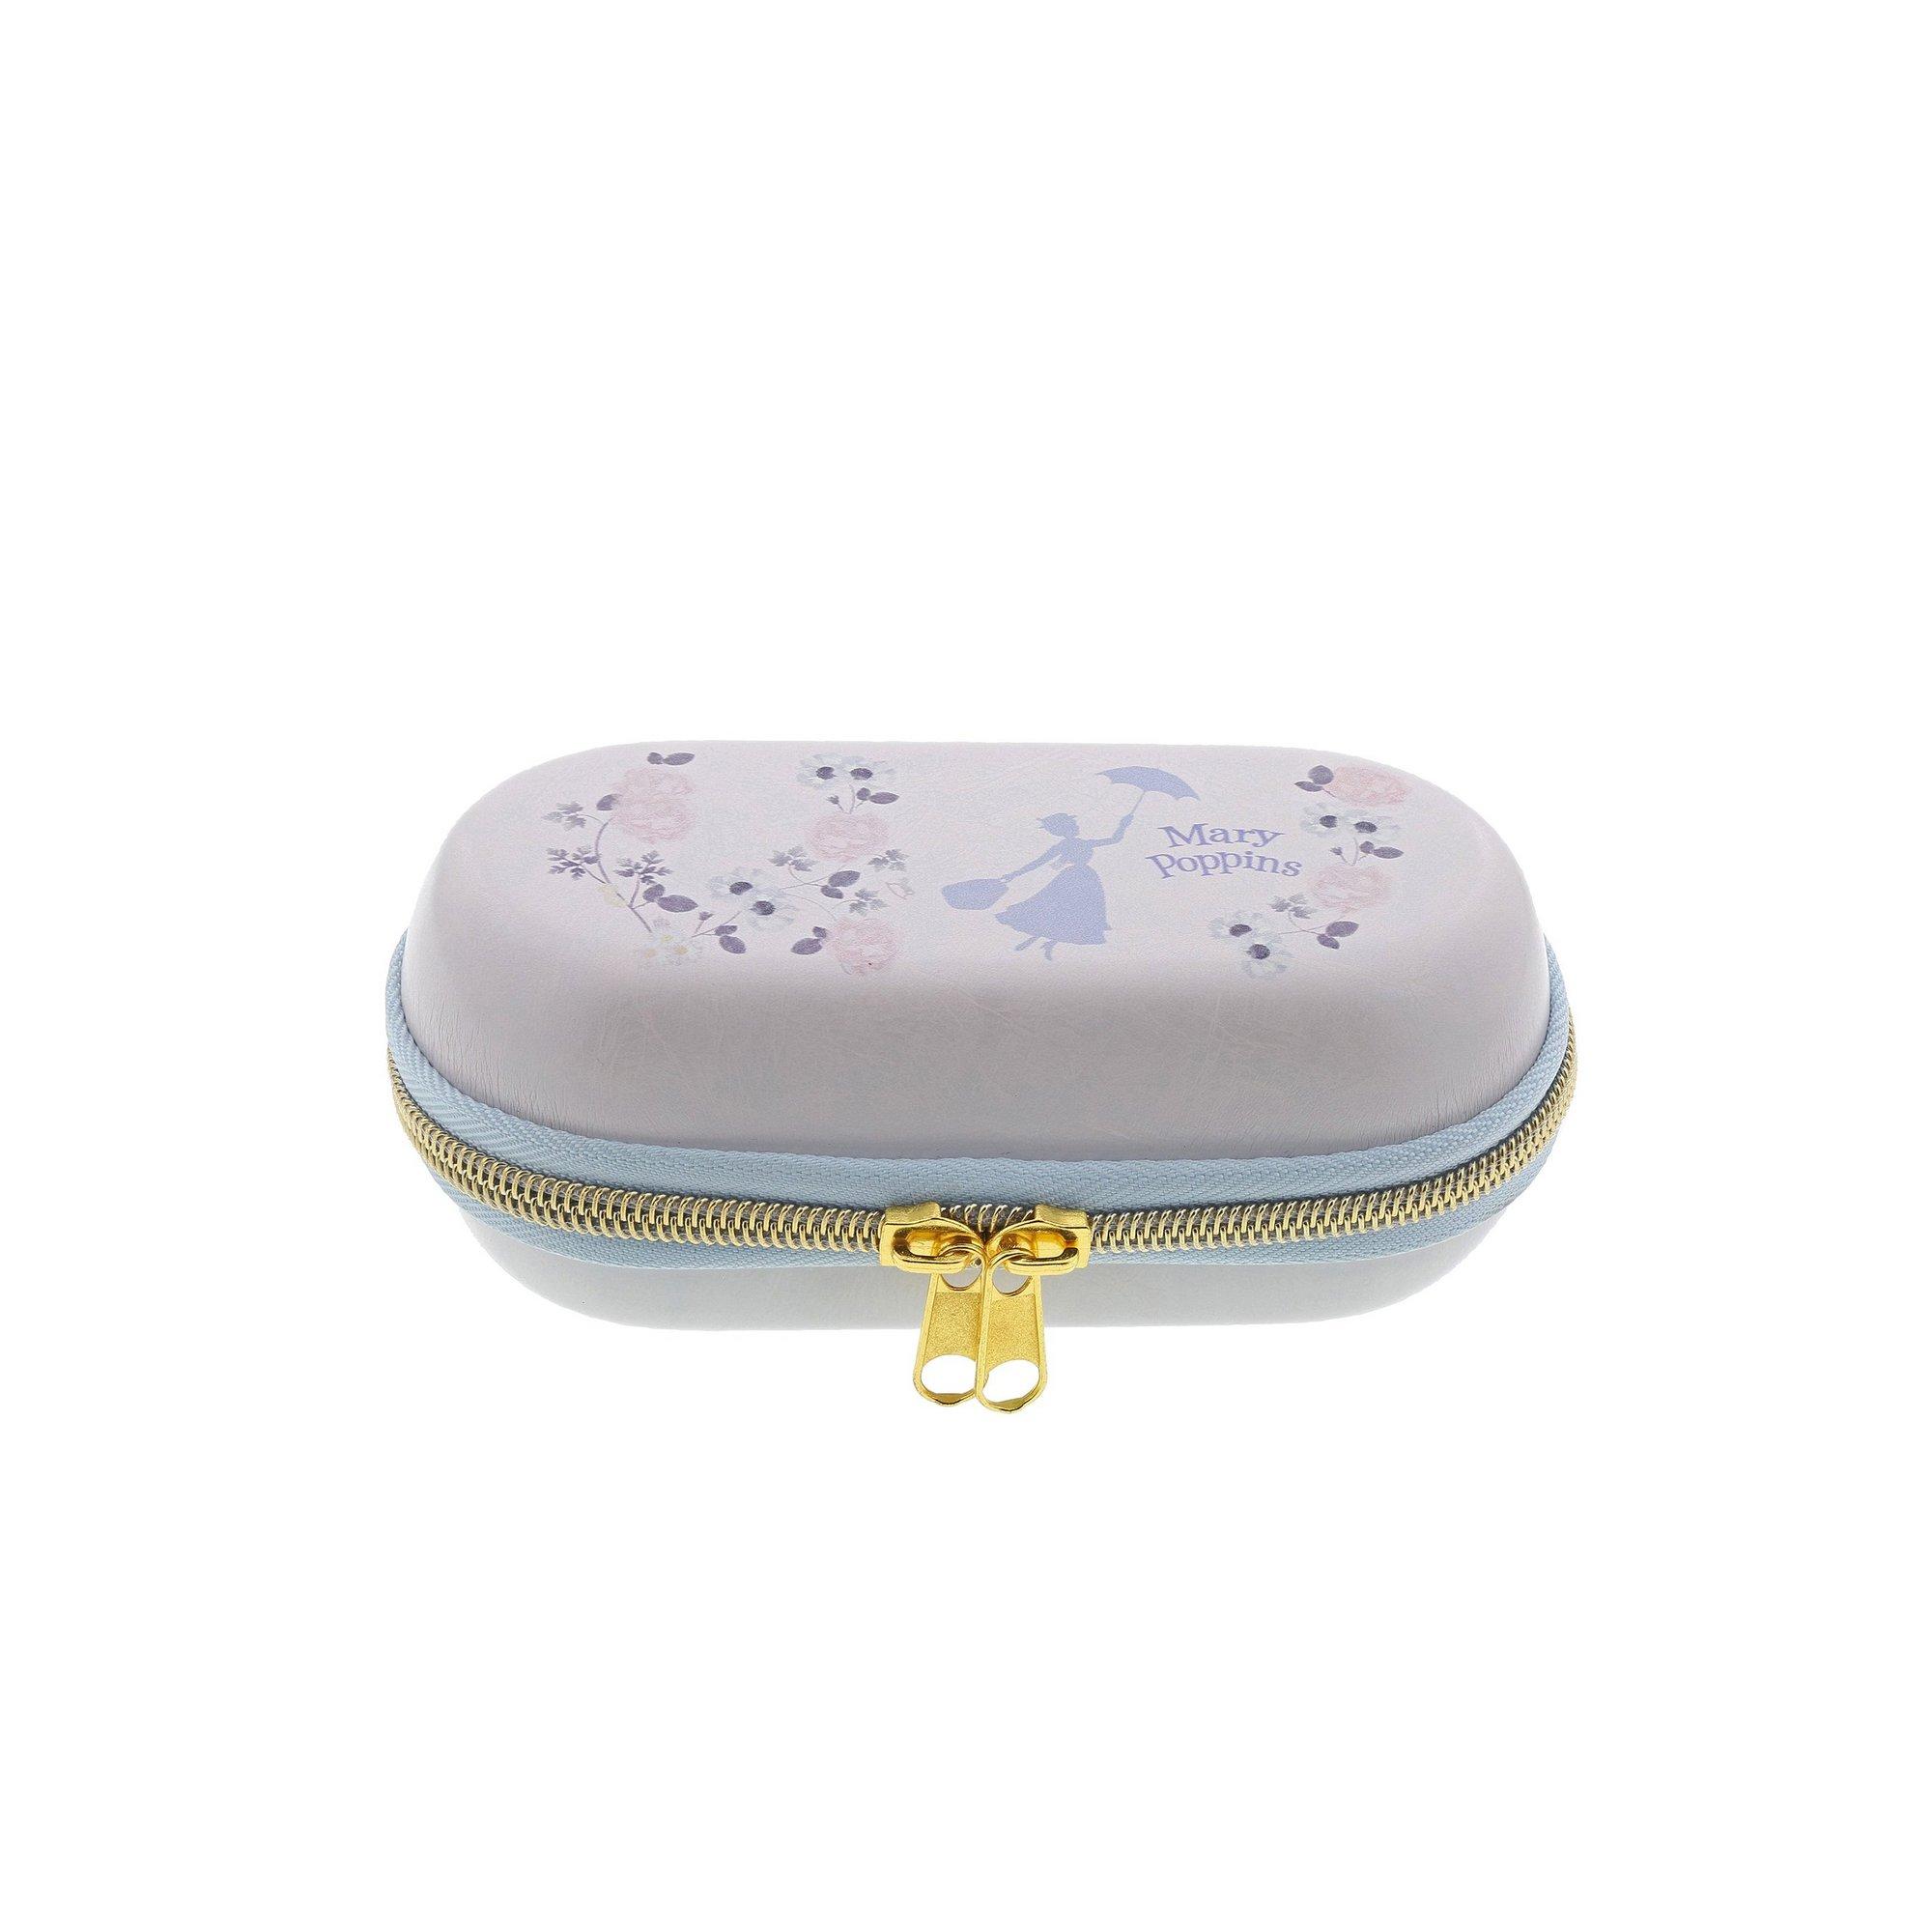 Image of Enchanting Disney Mary Poppins Glasses Case